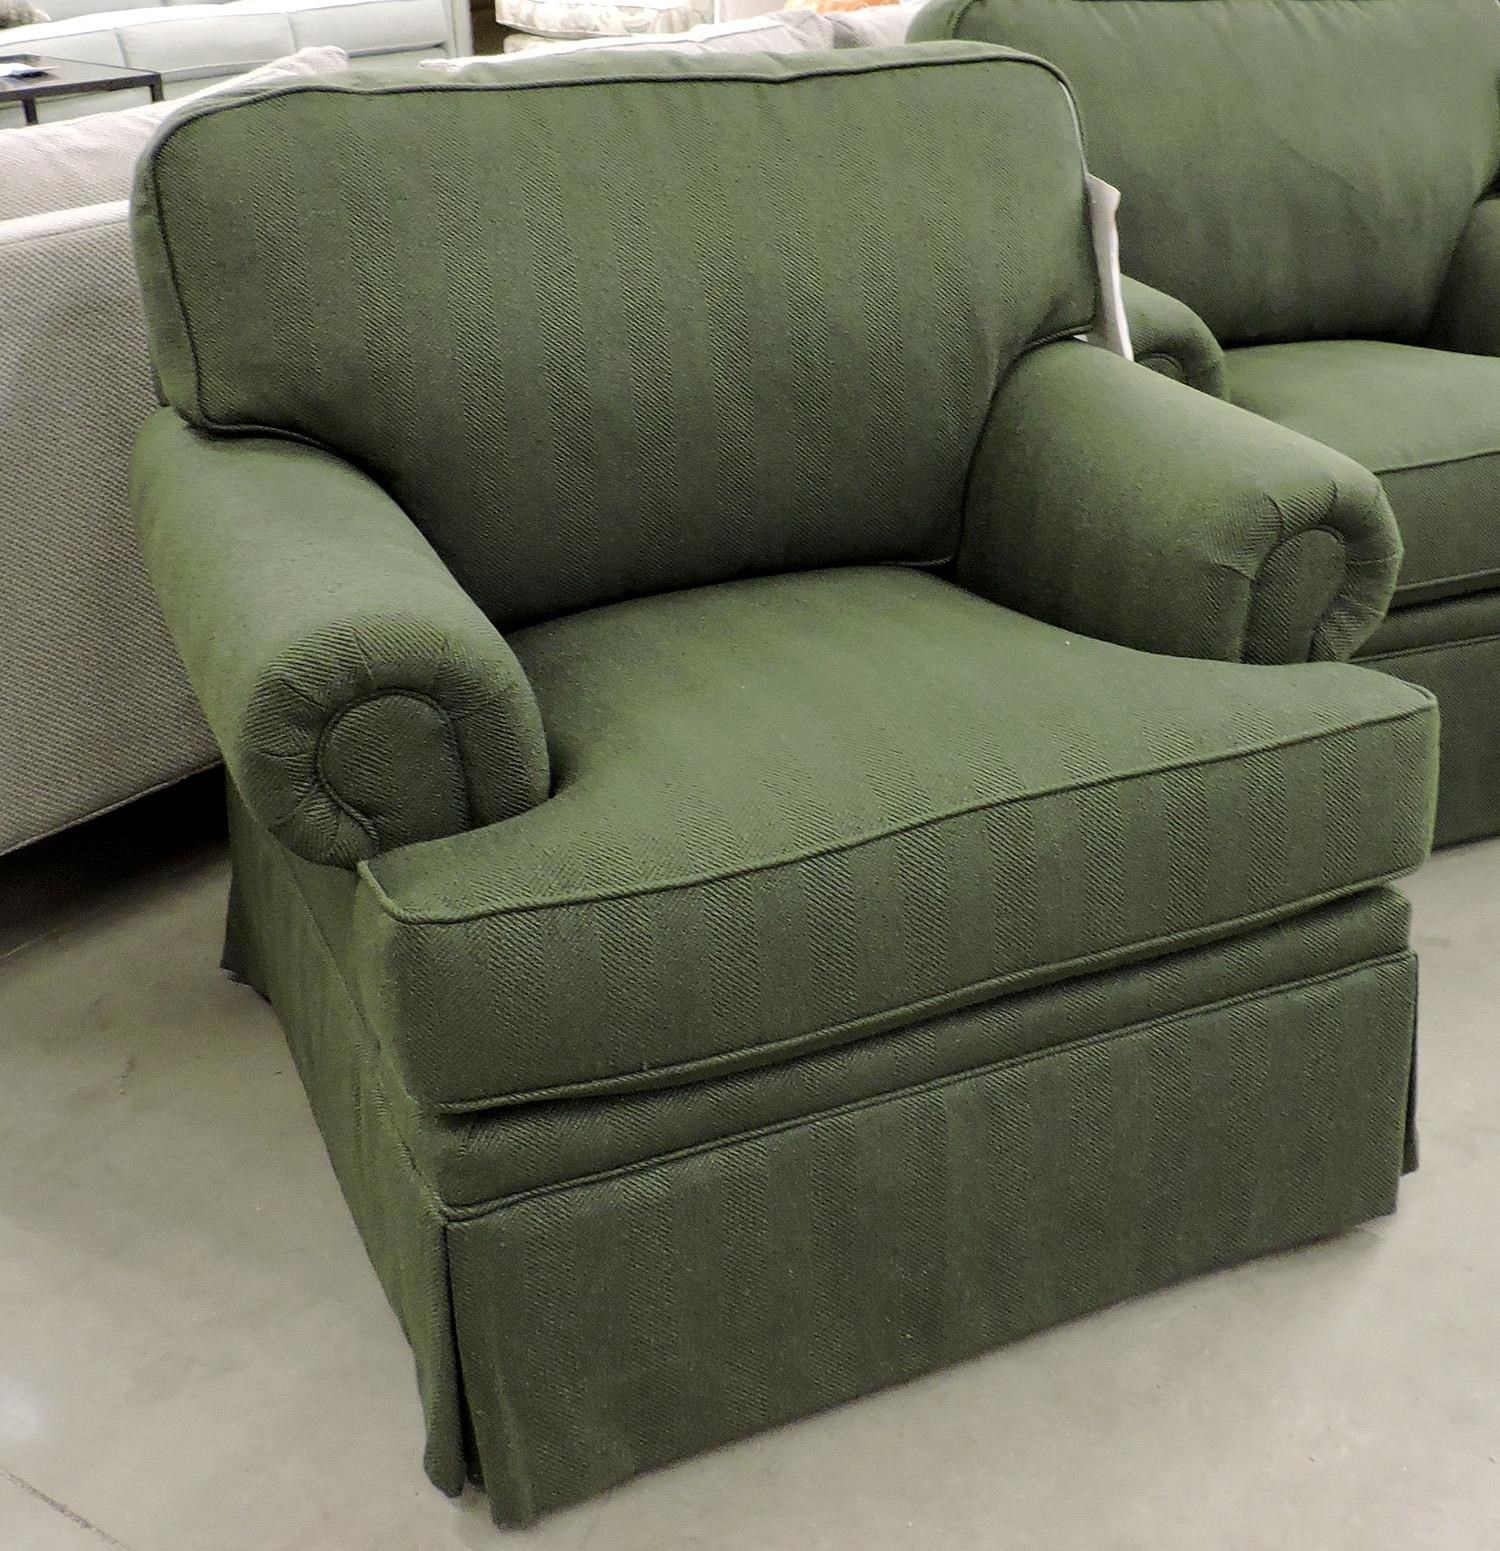 Huntington House Clearance Beckett Chair - Item Number: 204150828